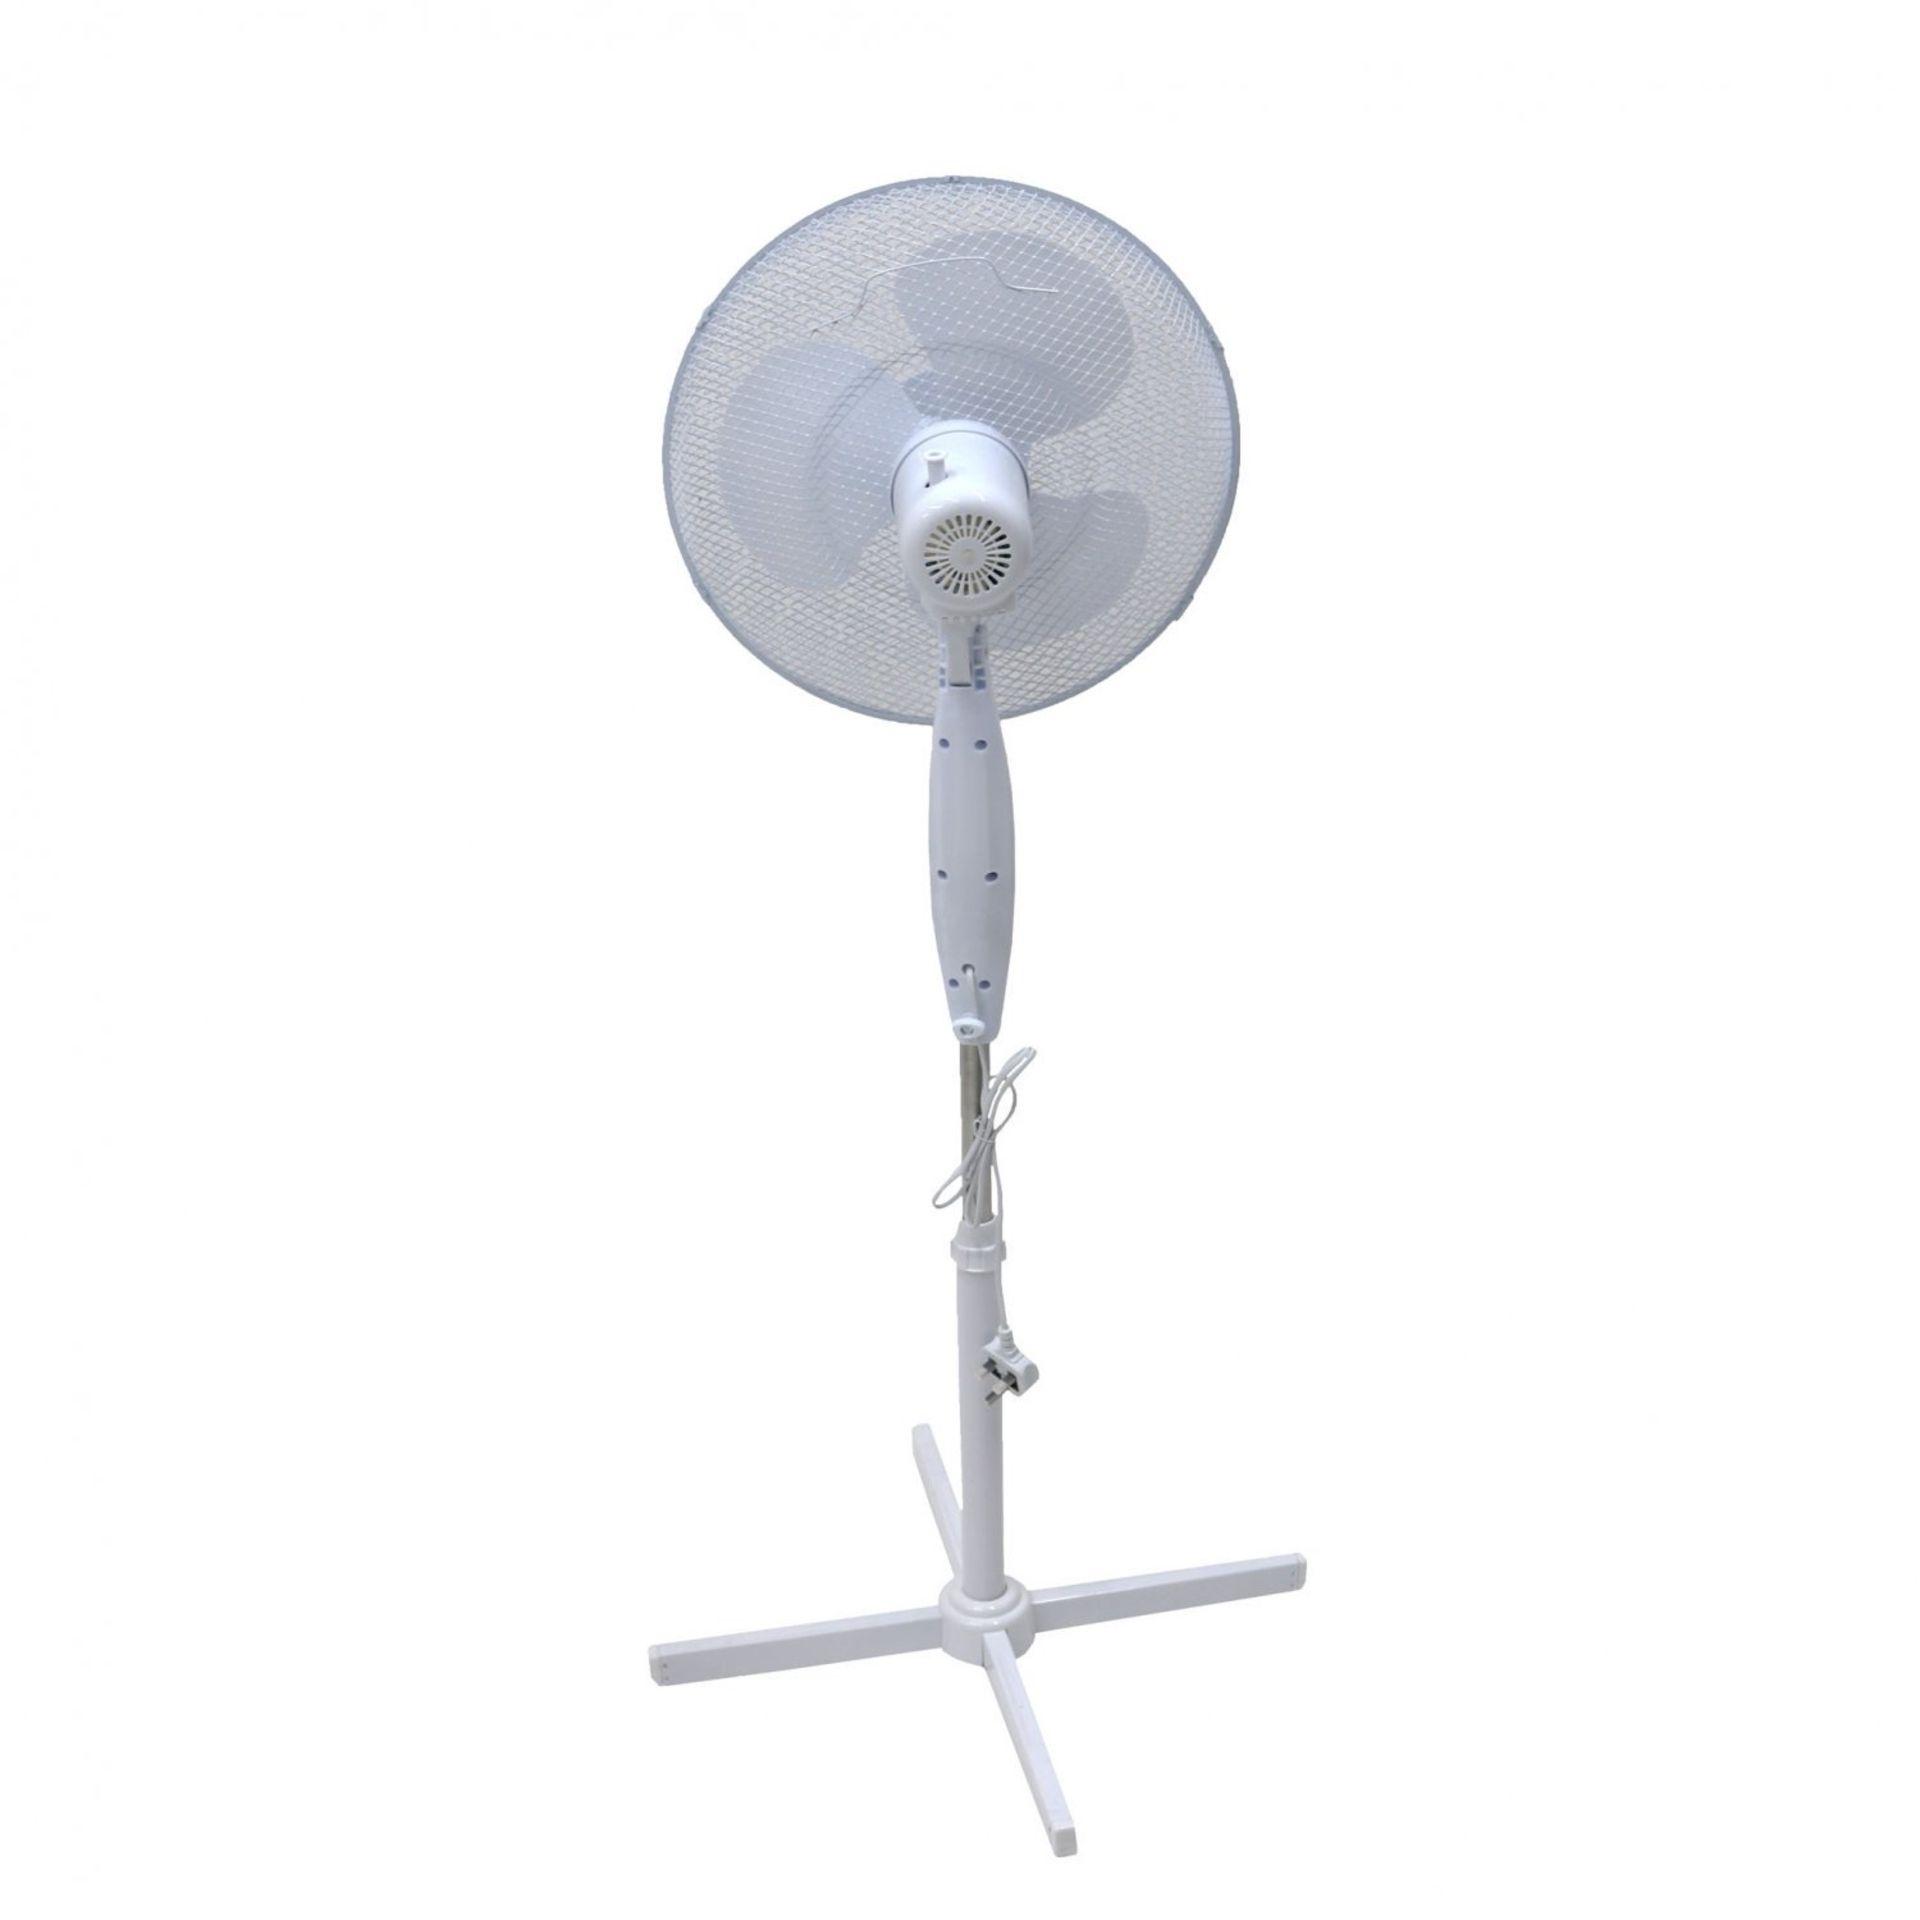 "Lot 4 - (RU2) 16"" Oscillating Pedestal Electric Fan The fan head oscillates and tilts which mea..."